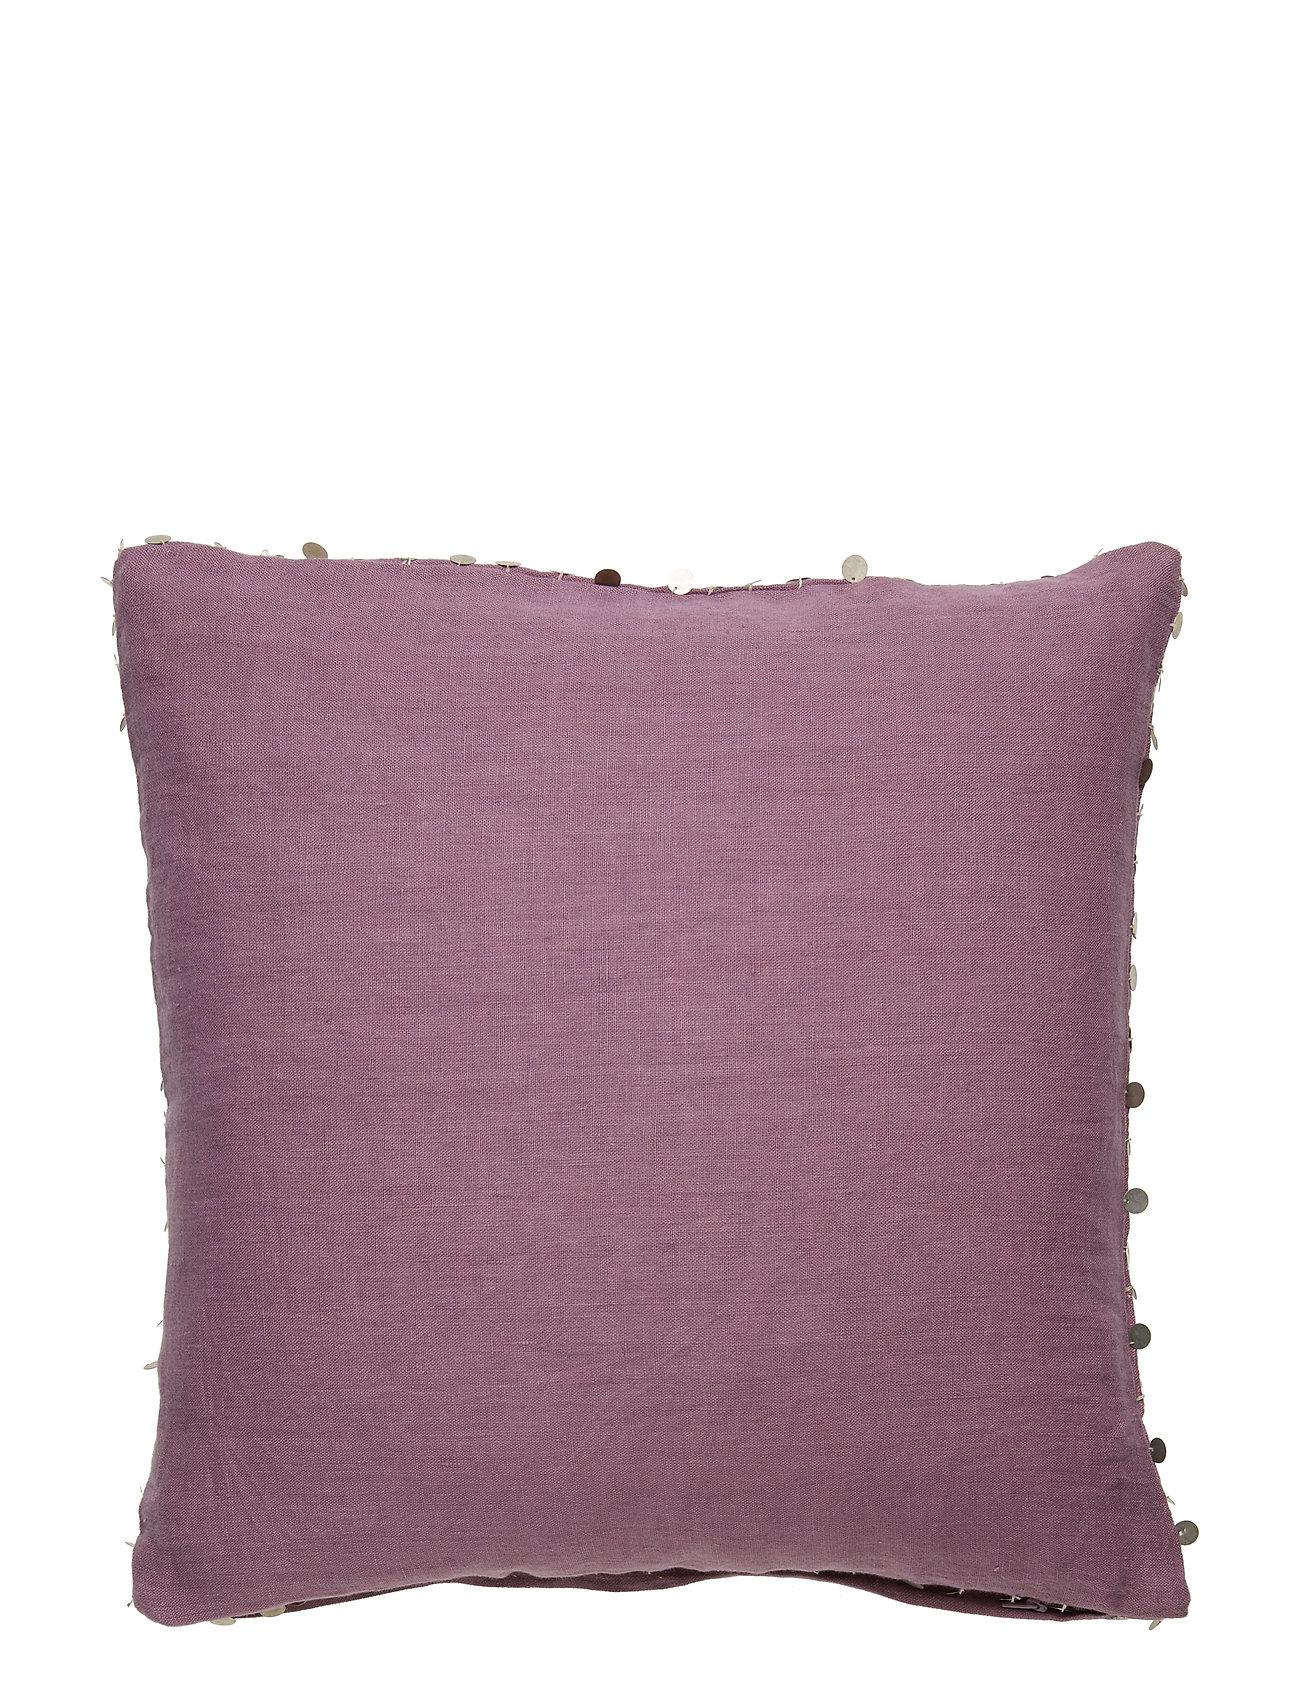 DAY Home Day Cushion Maroc - LILAC